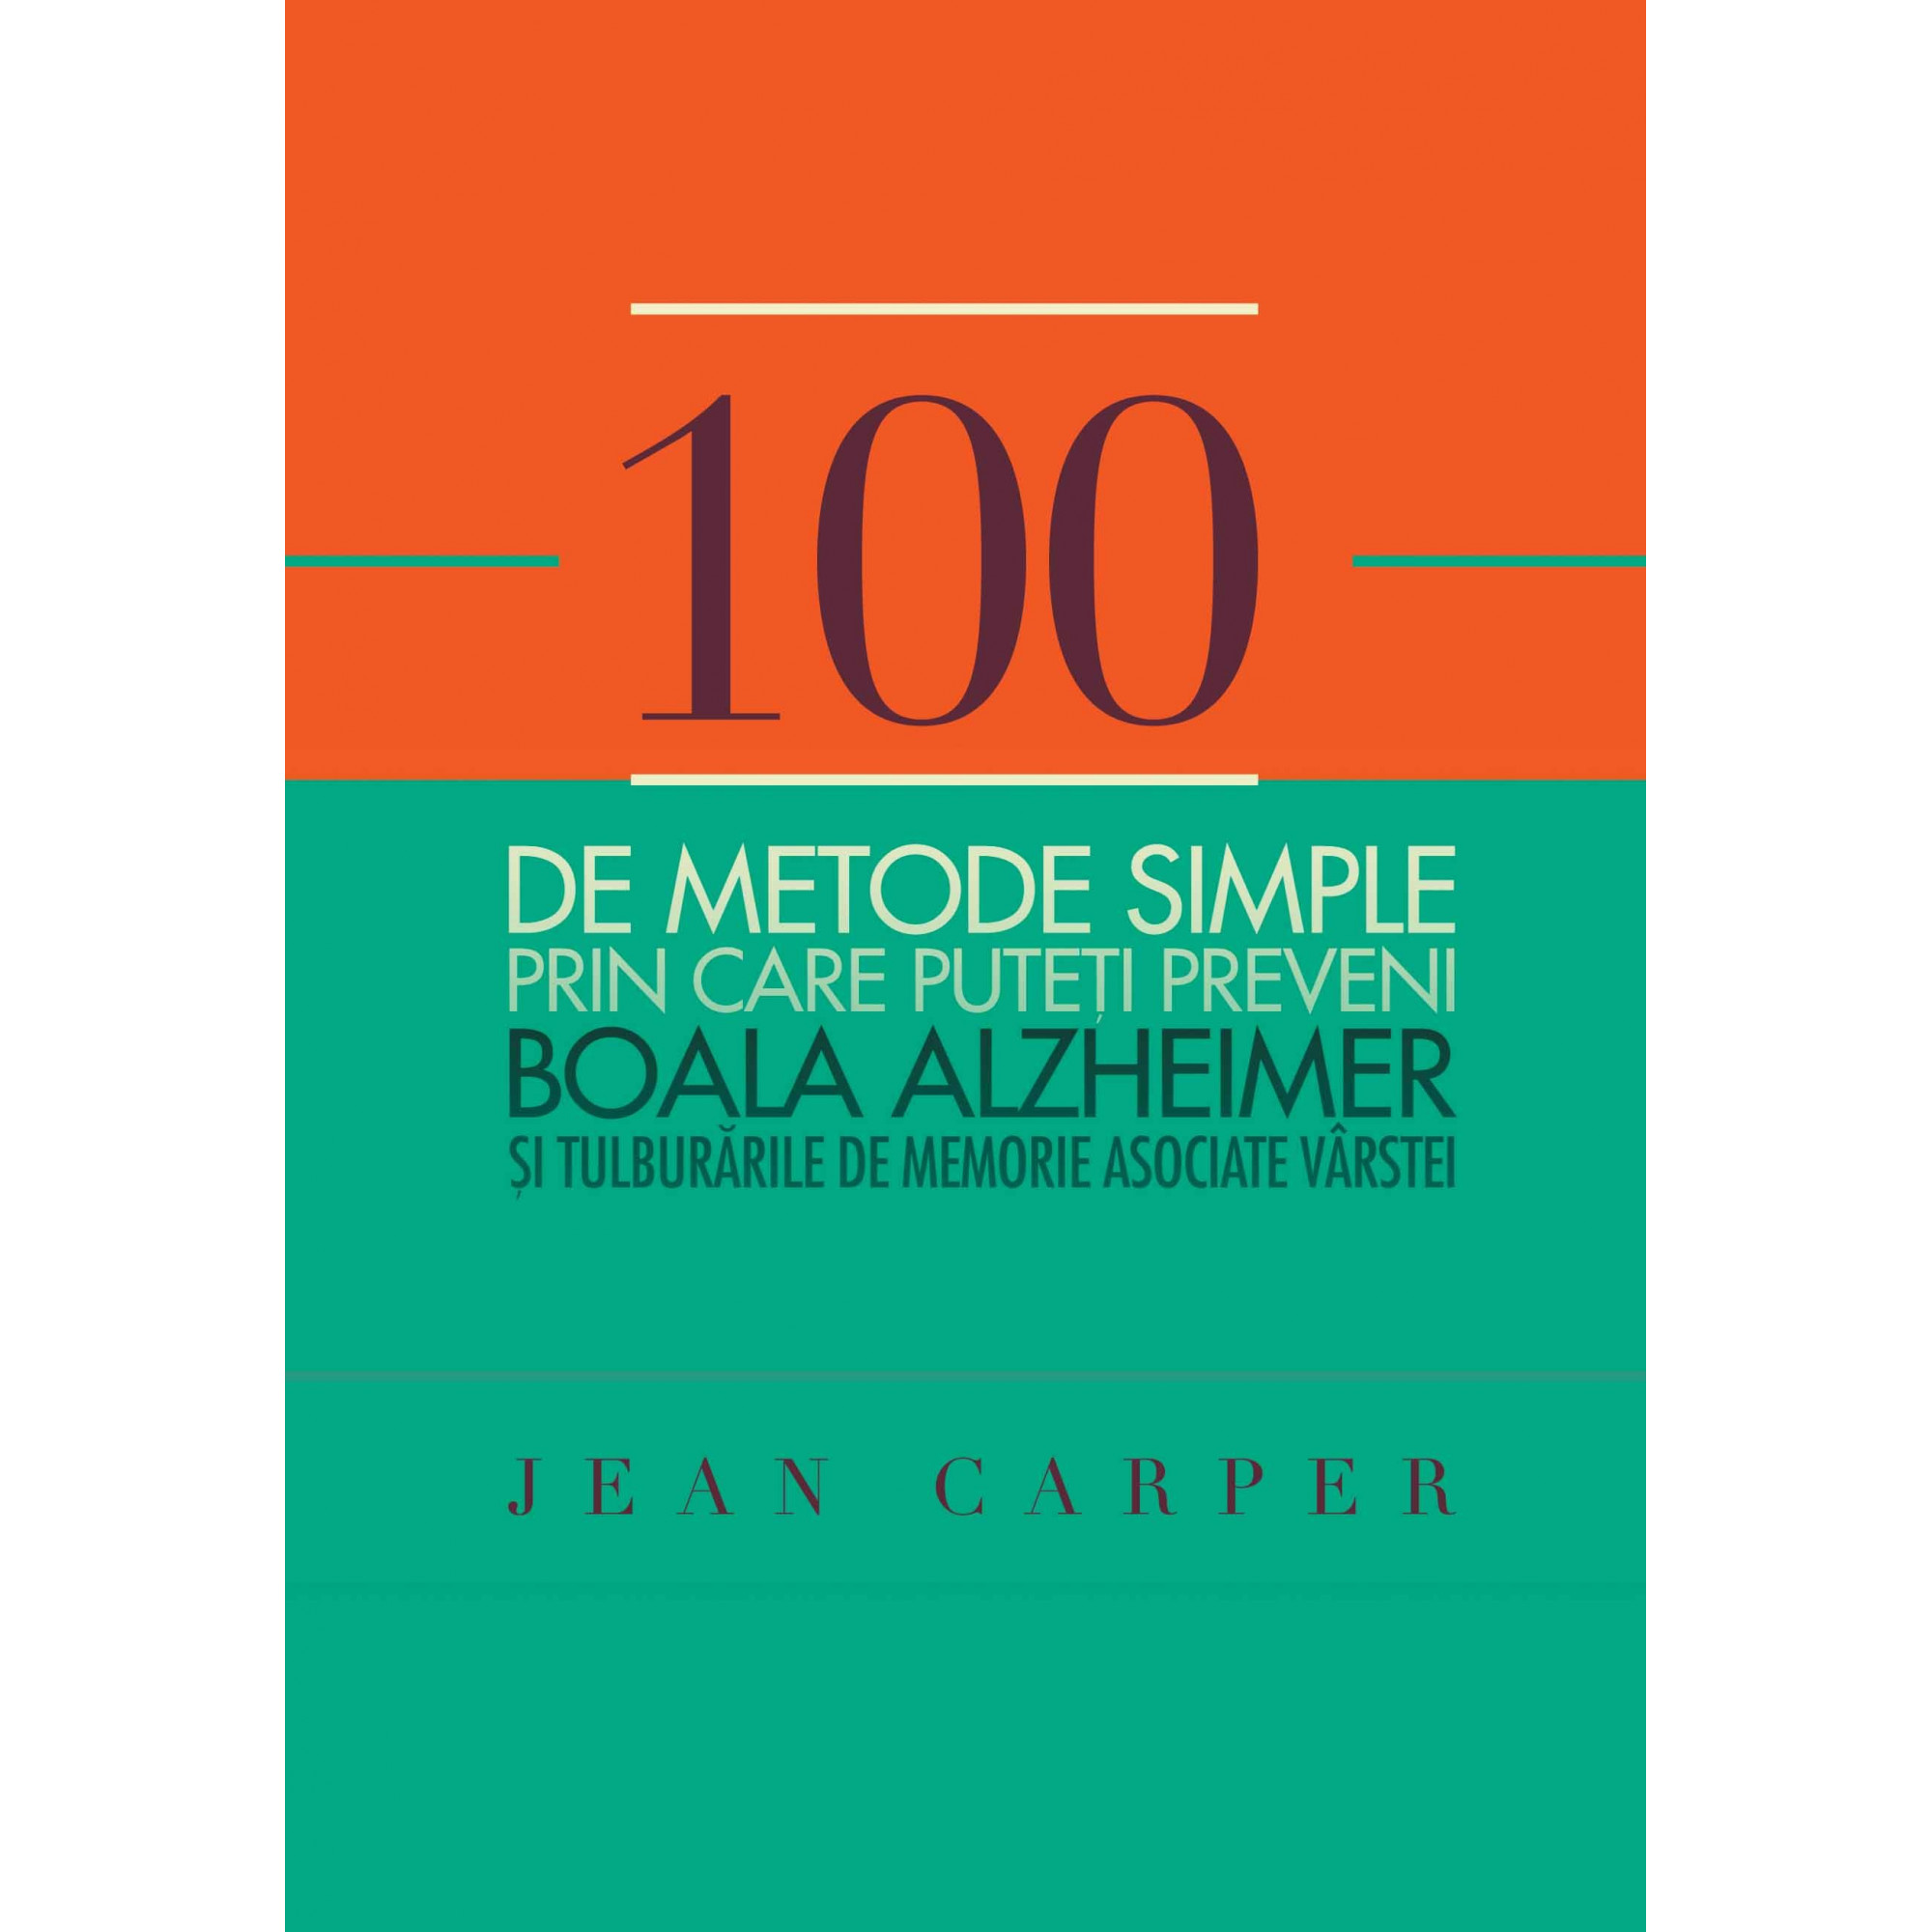 Alzheimer. 100 de metode simple prin care puteți preveni boala; Jean Carper